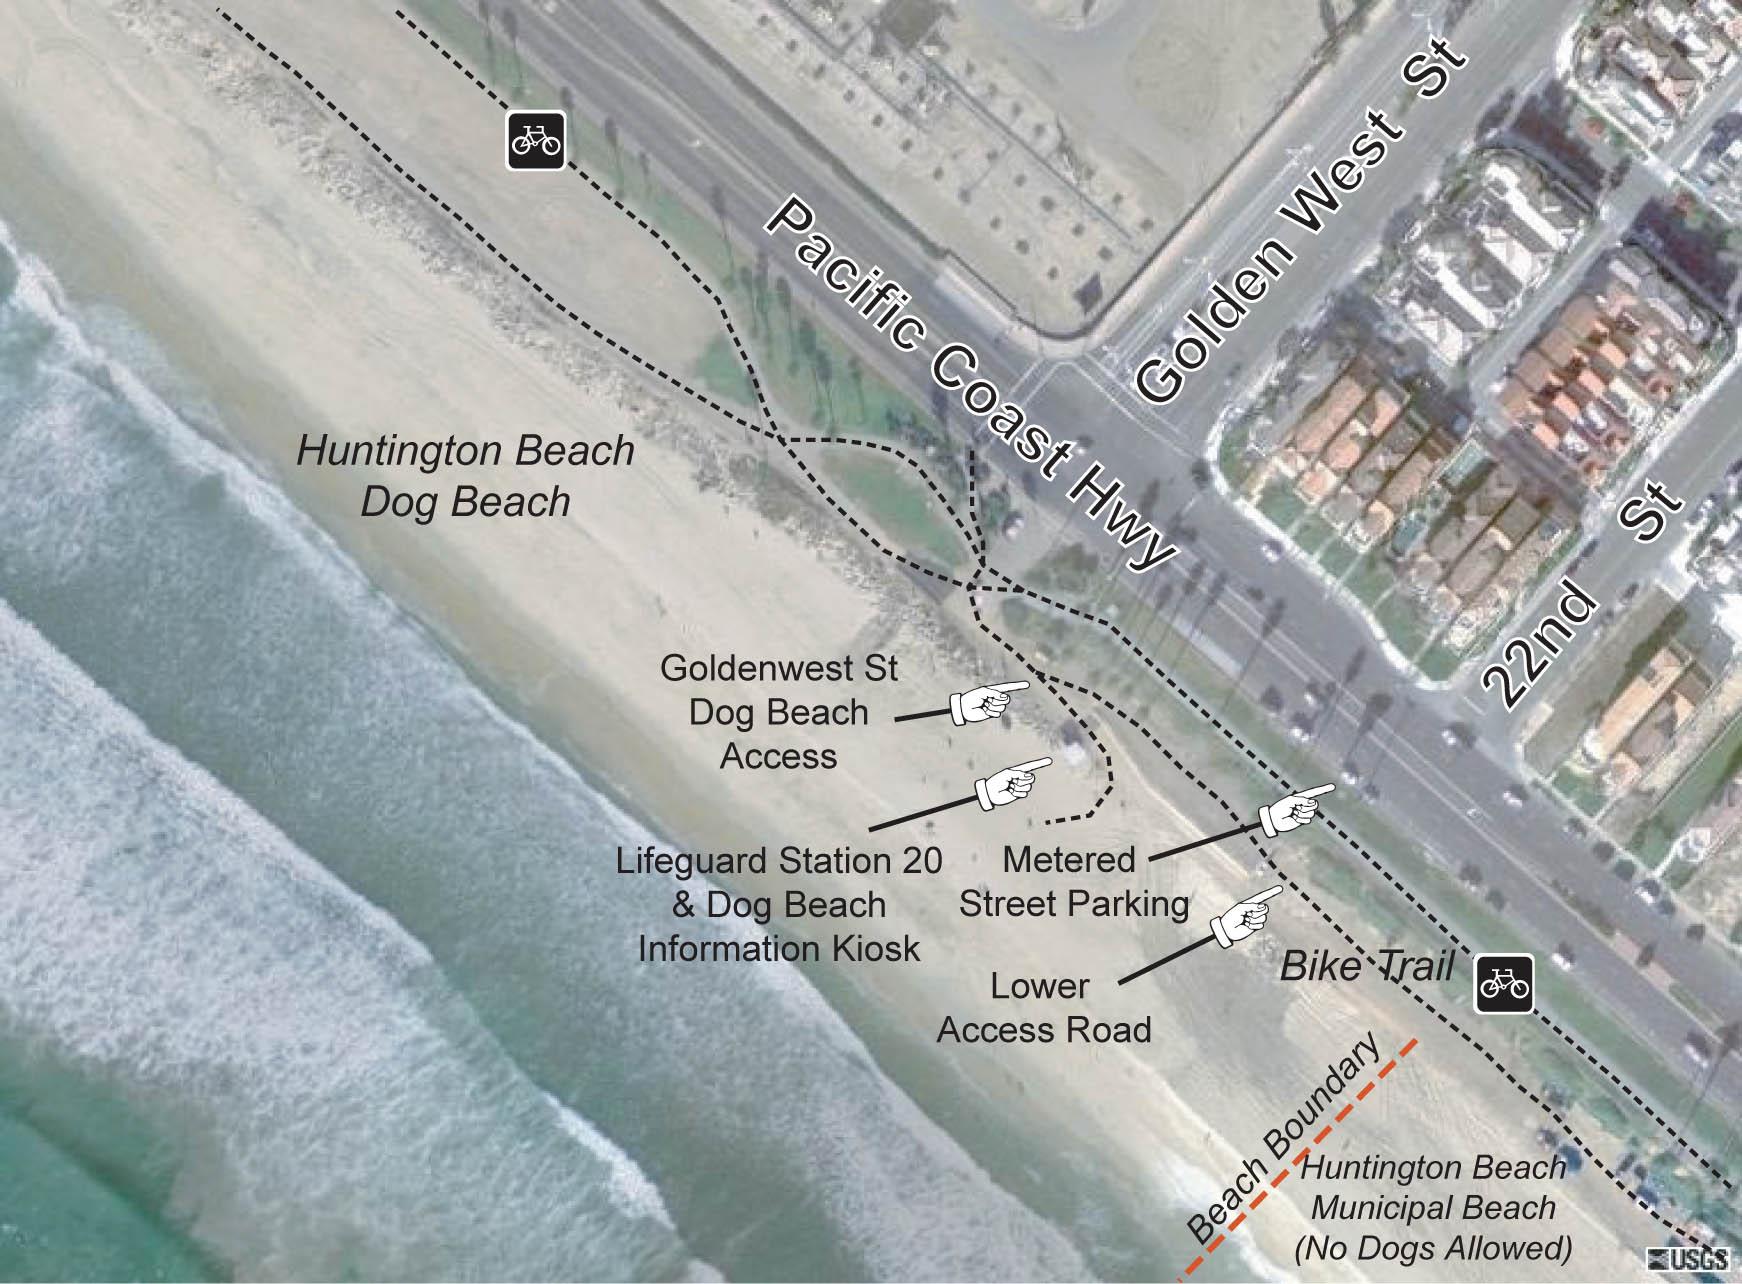 HB Dog Beach Southern Access